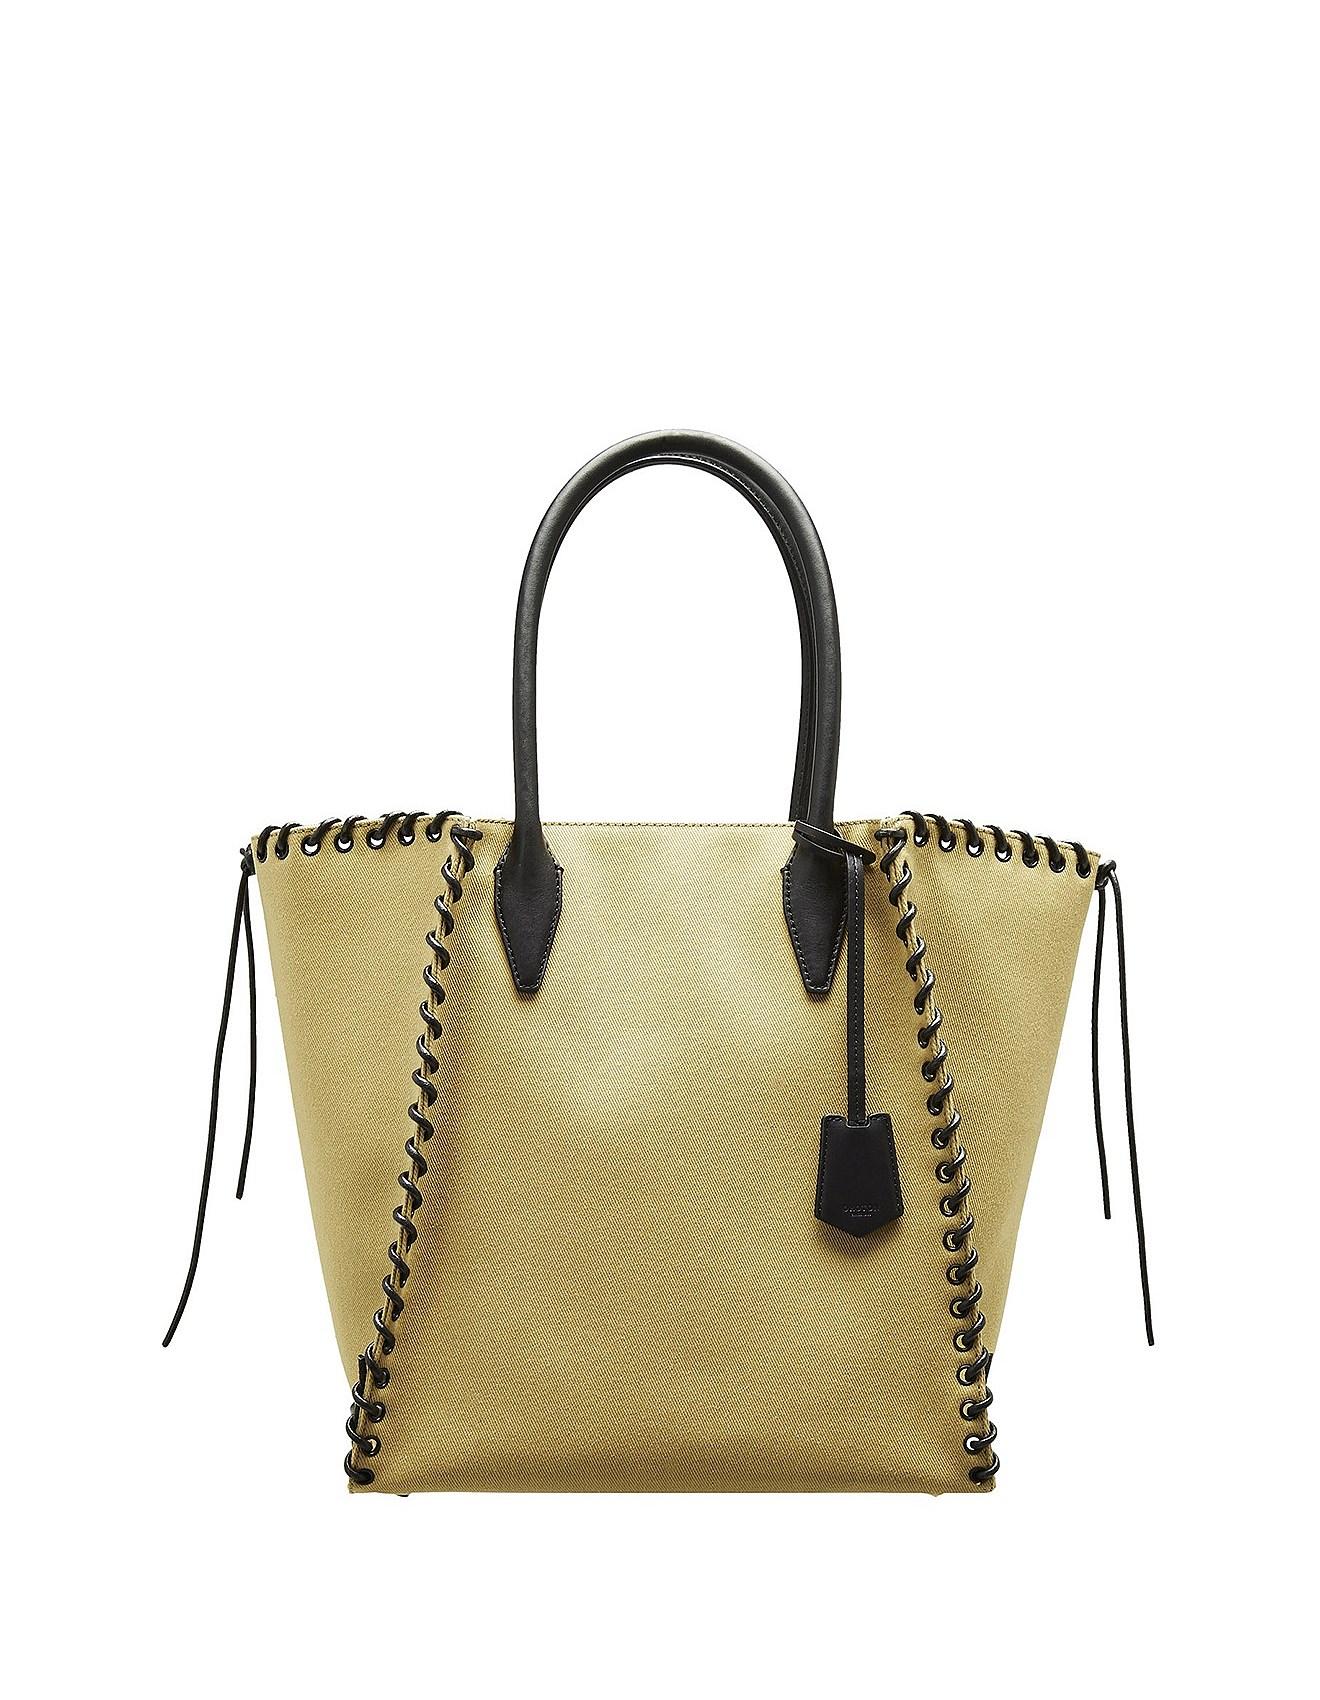 ccac36b88fd375 Oroton | Buy Oroton Bags & Wallets Online | David Jones - Covet Canvas- Large  Day Bag